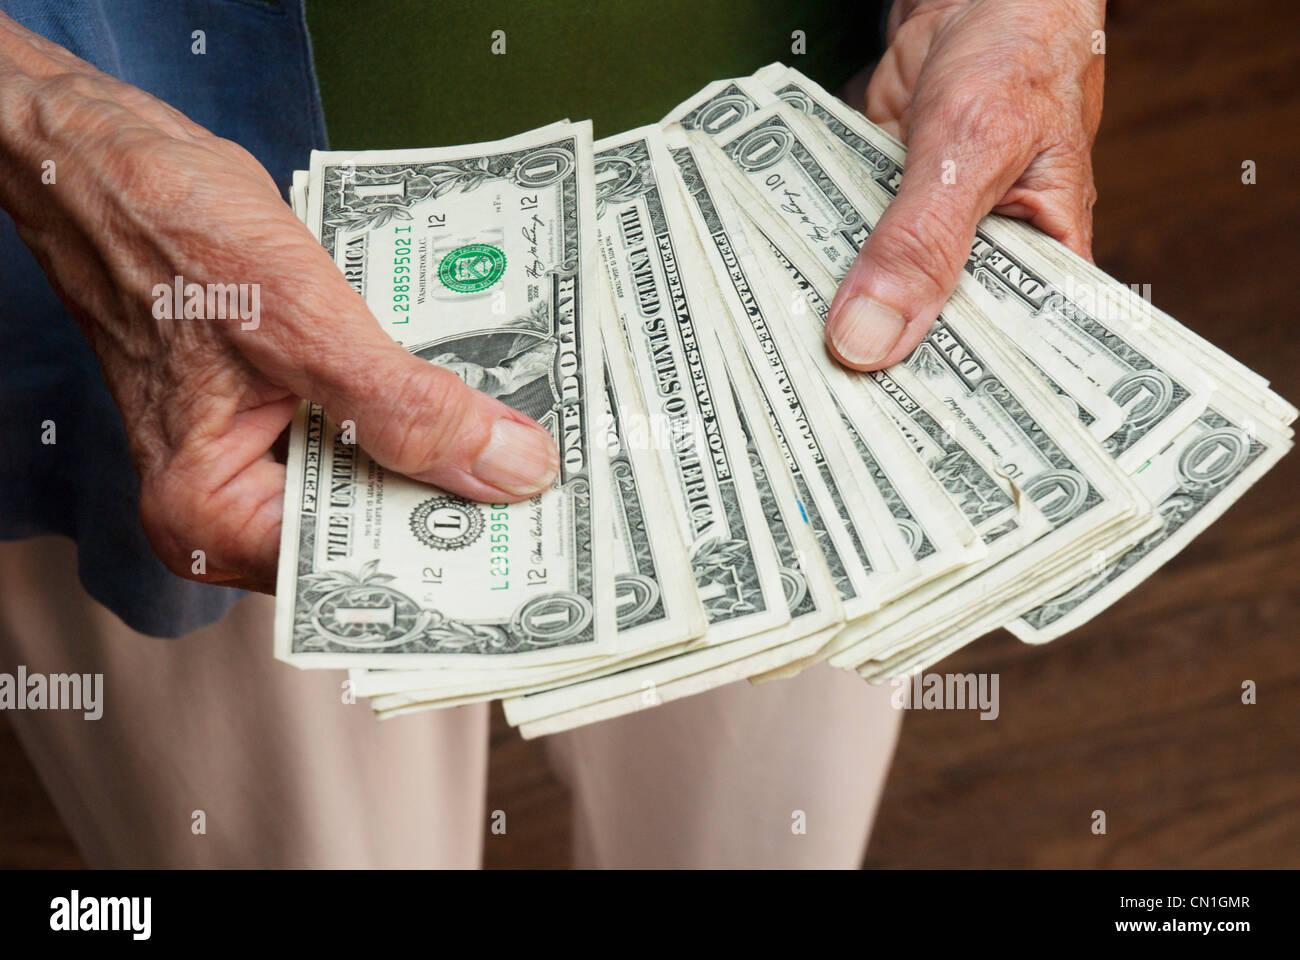 Older Woman's Hands Holding Dollar Bills Photo Stock